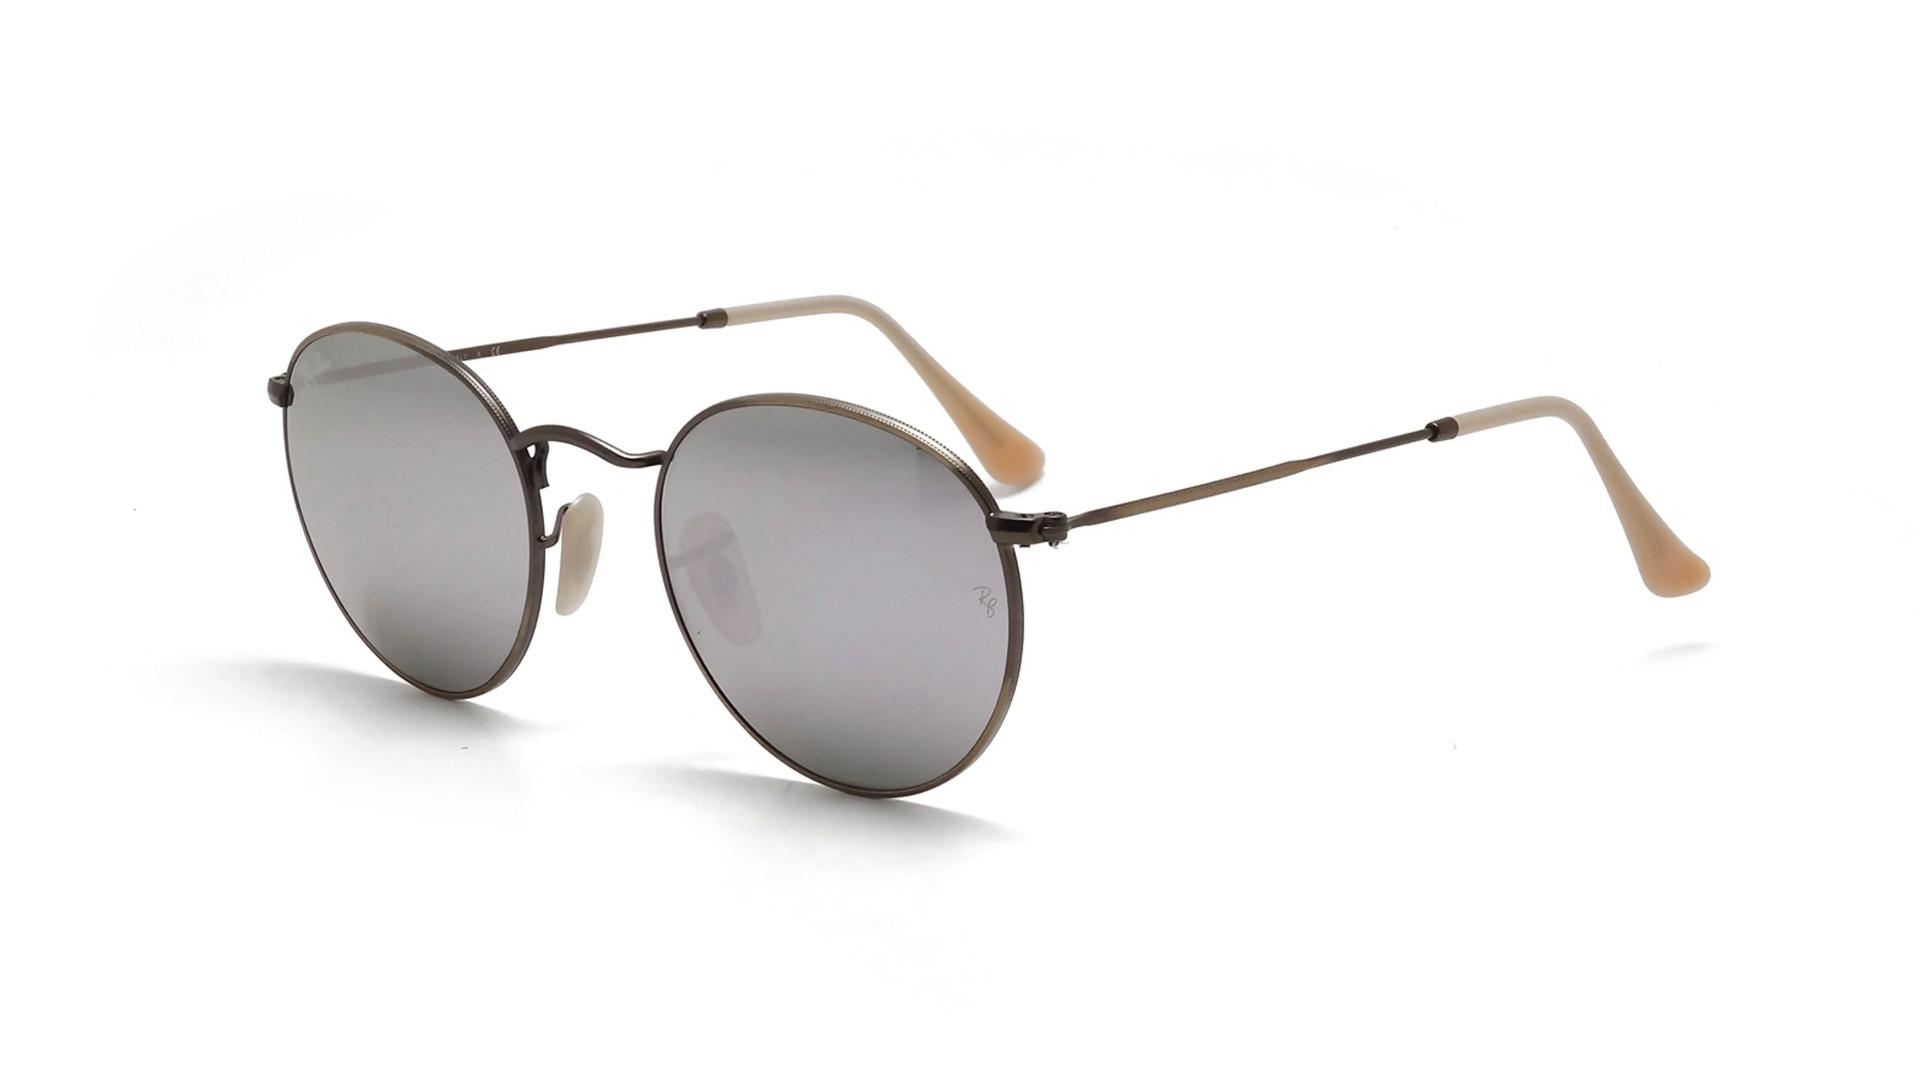 f3f0cd1e4 Sunglasses Ray-Ban Round Metal Brown Flash Lenses RB3447 167/4K 50-21  Medium Mirror